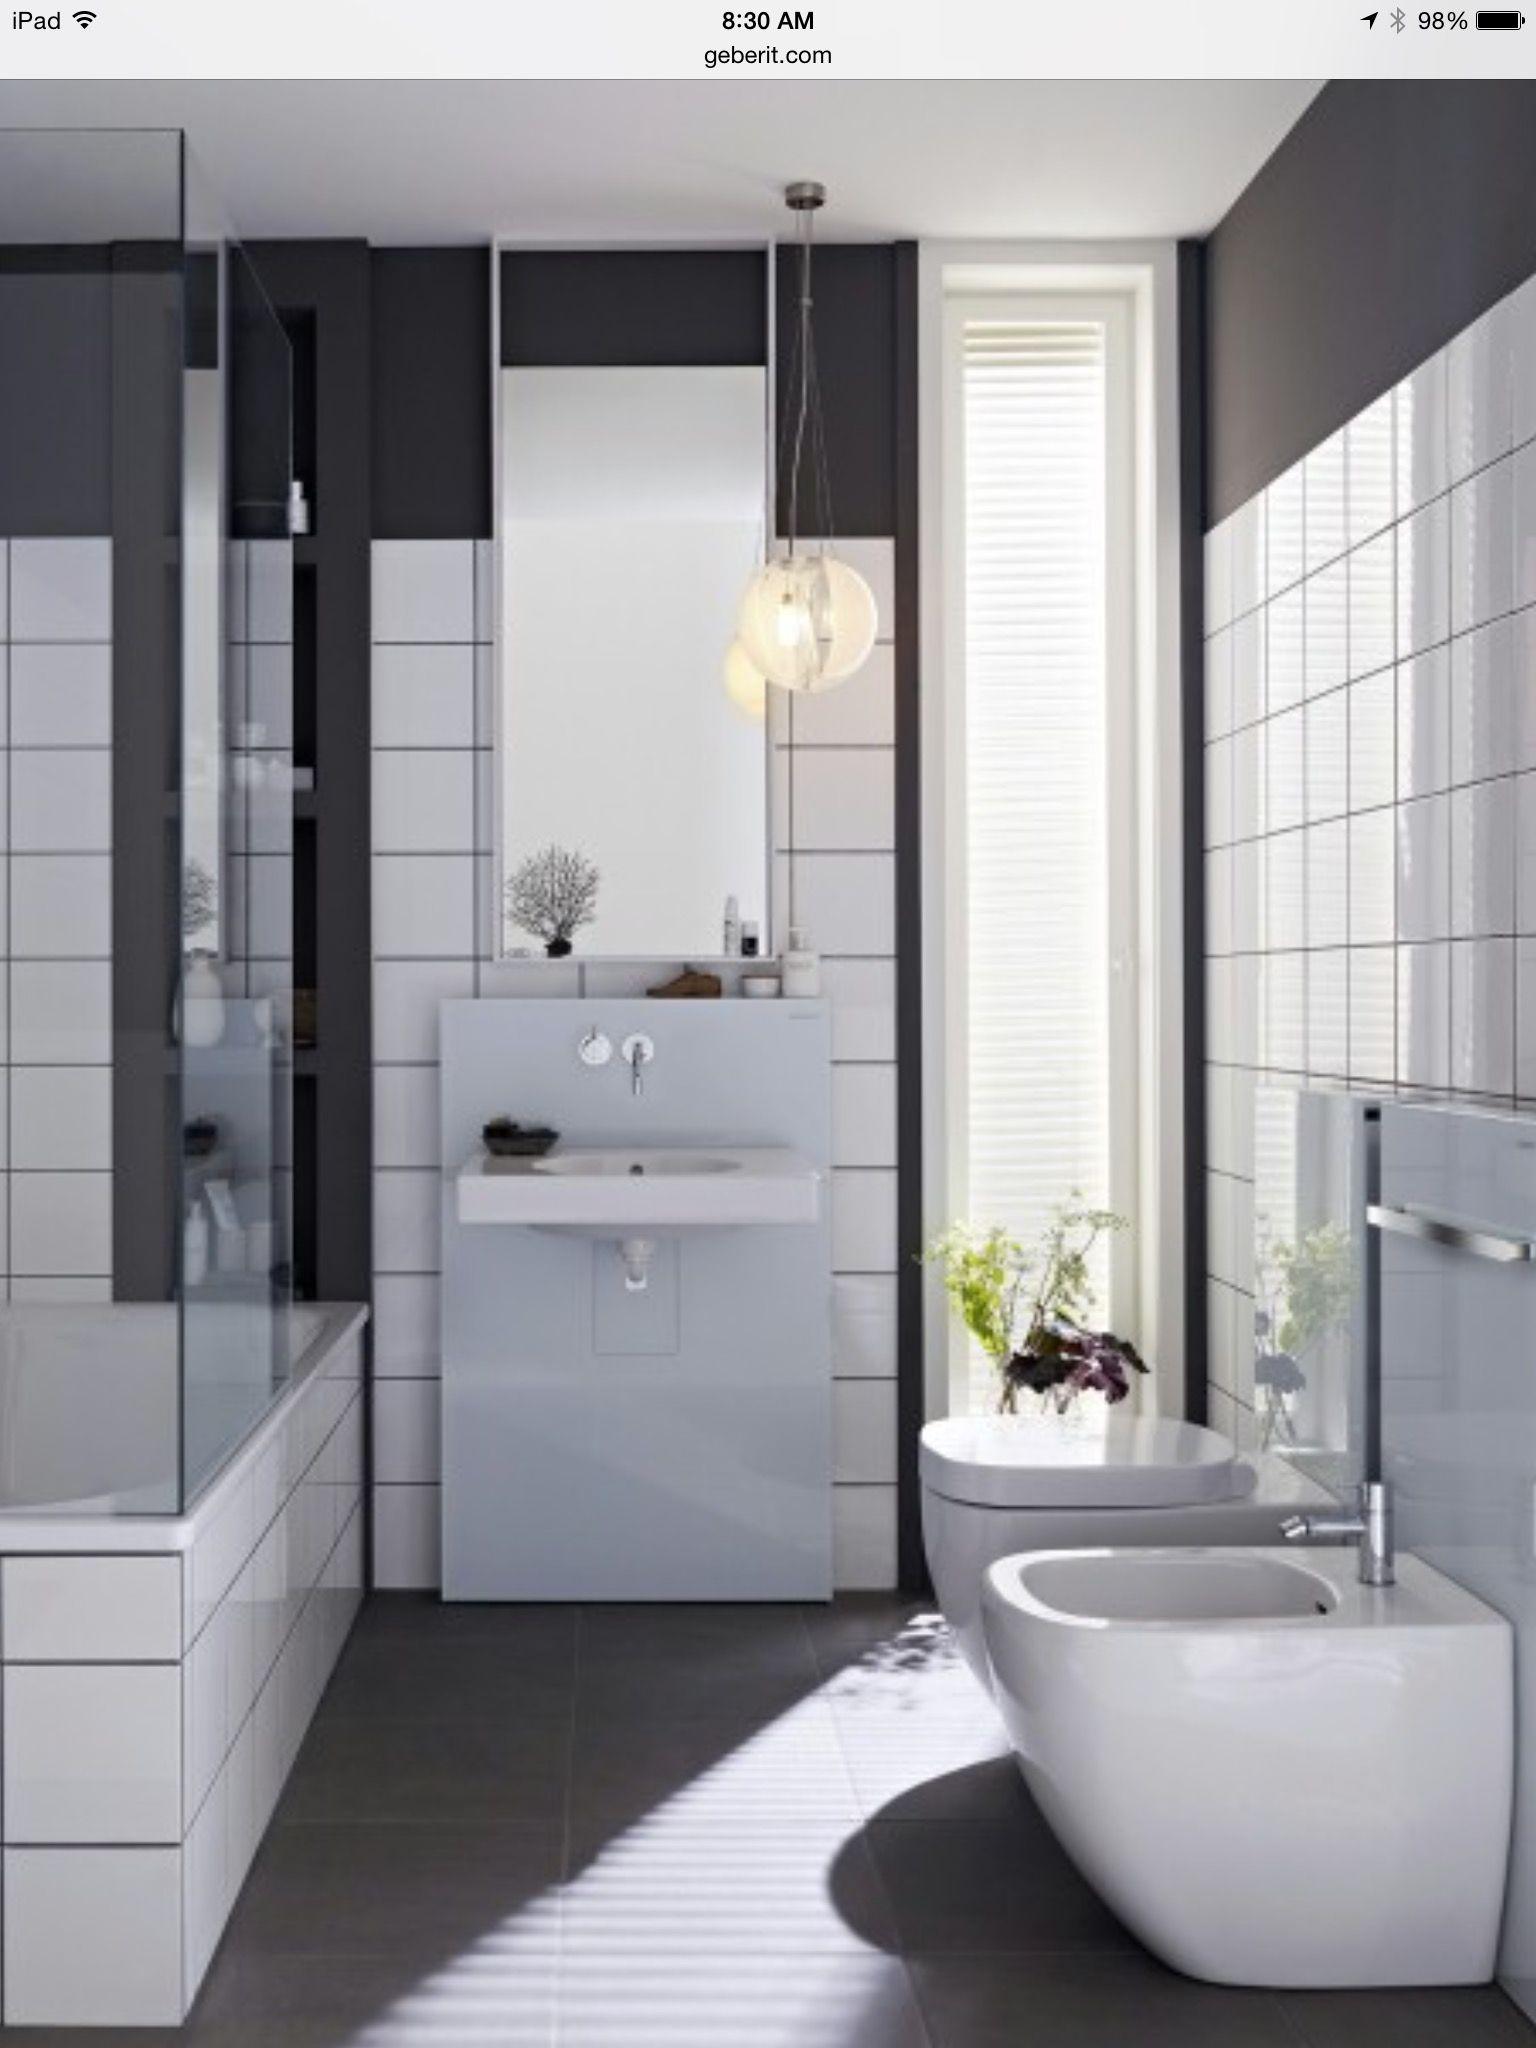 pin by s. myers on baths | pinterest | bath